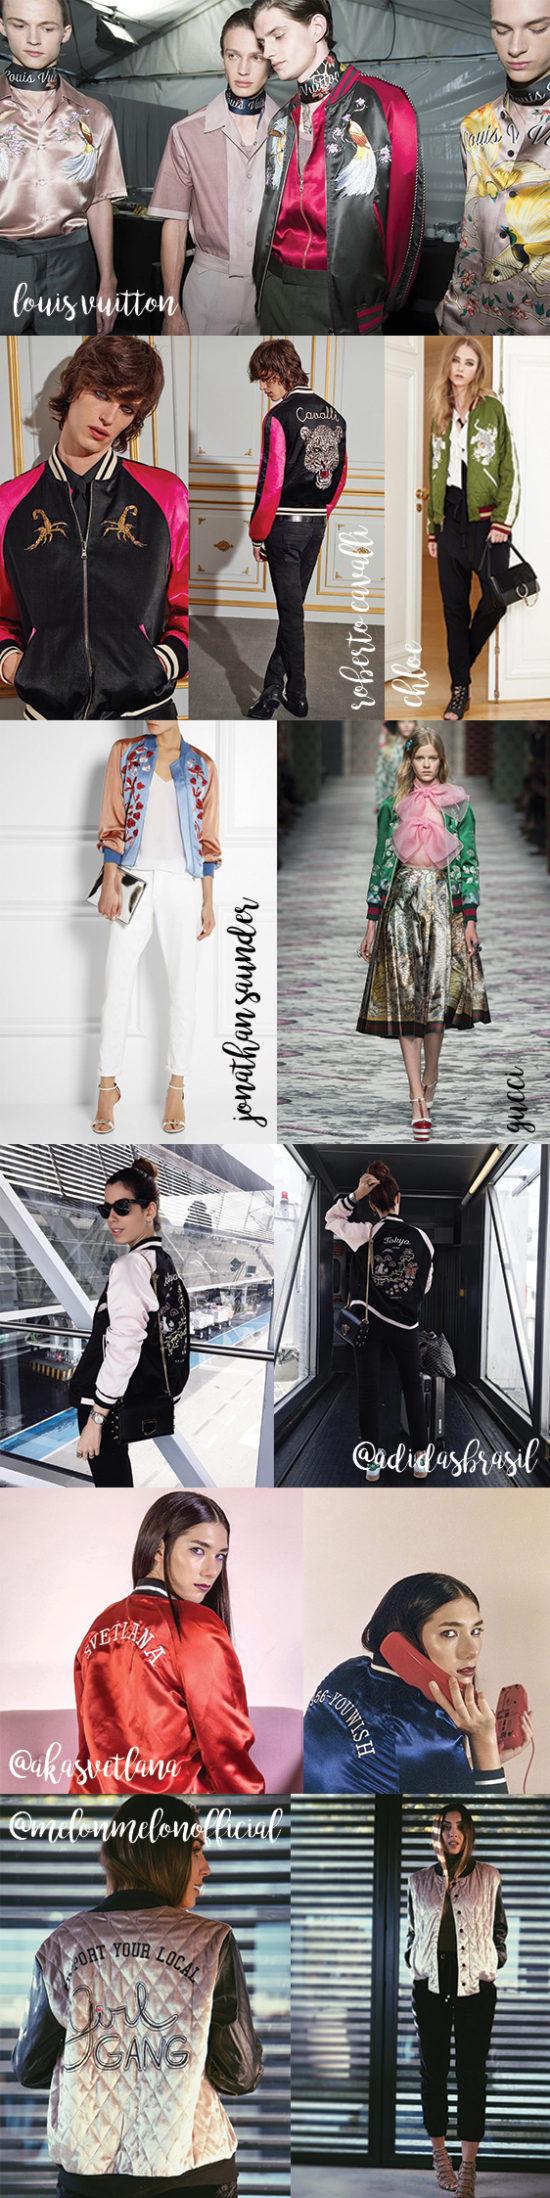 jaqueta-tendencia-bomber-satin-cetim-moda-estilo-trend-blog-onde-comprar